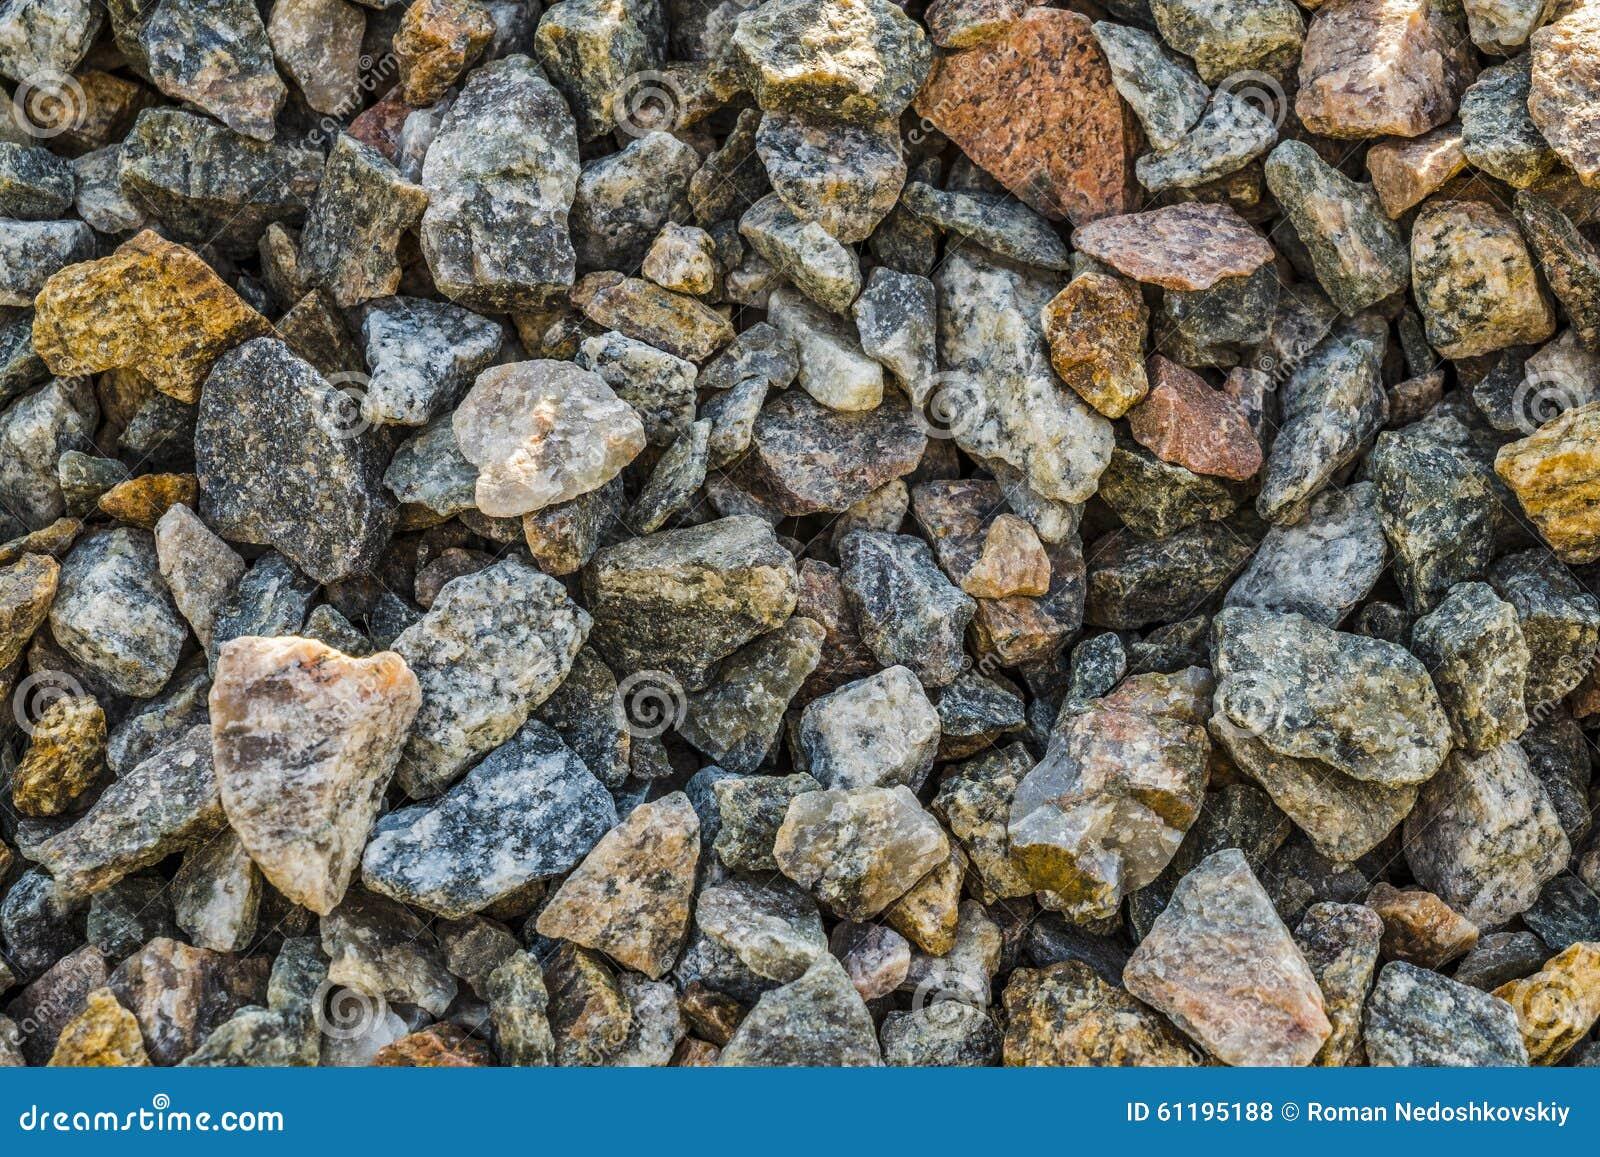 Clean Granite Stone : Crushed stone stock photo image